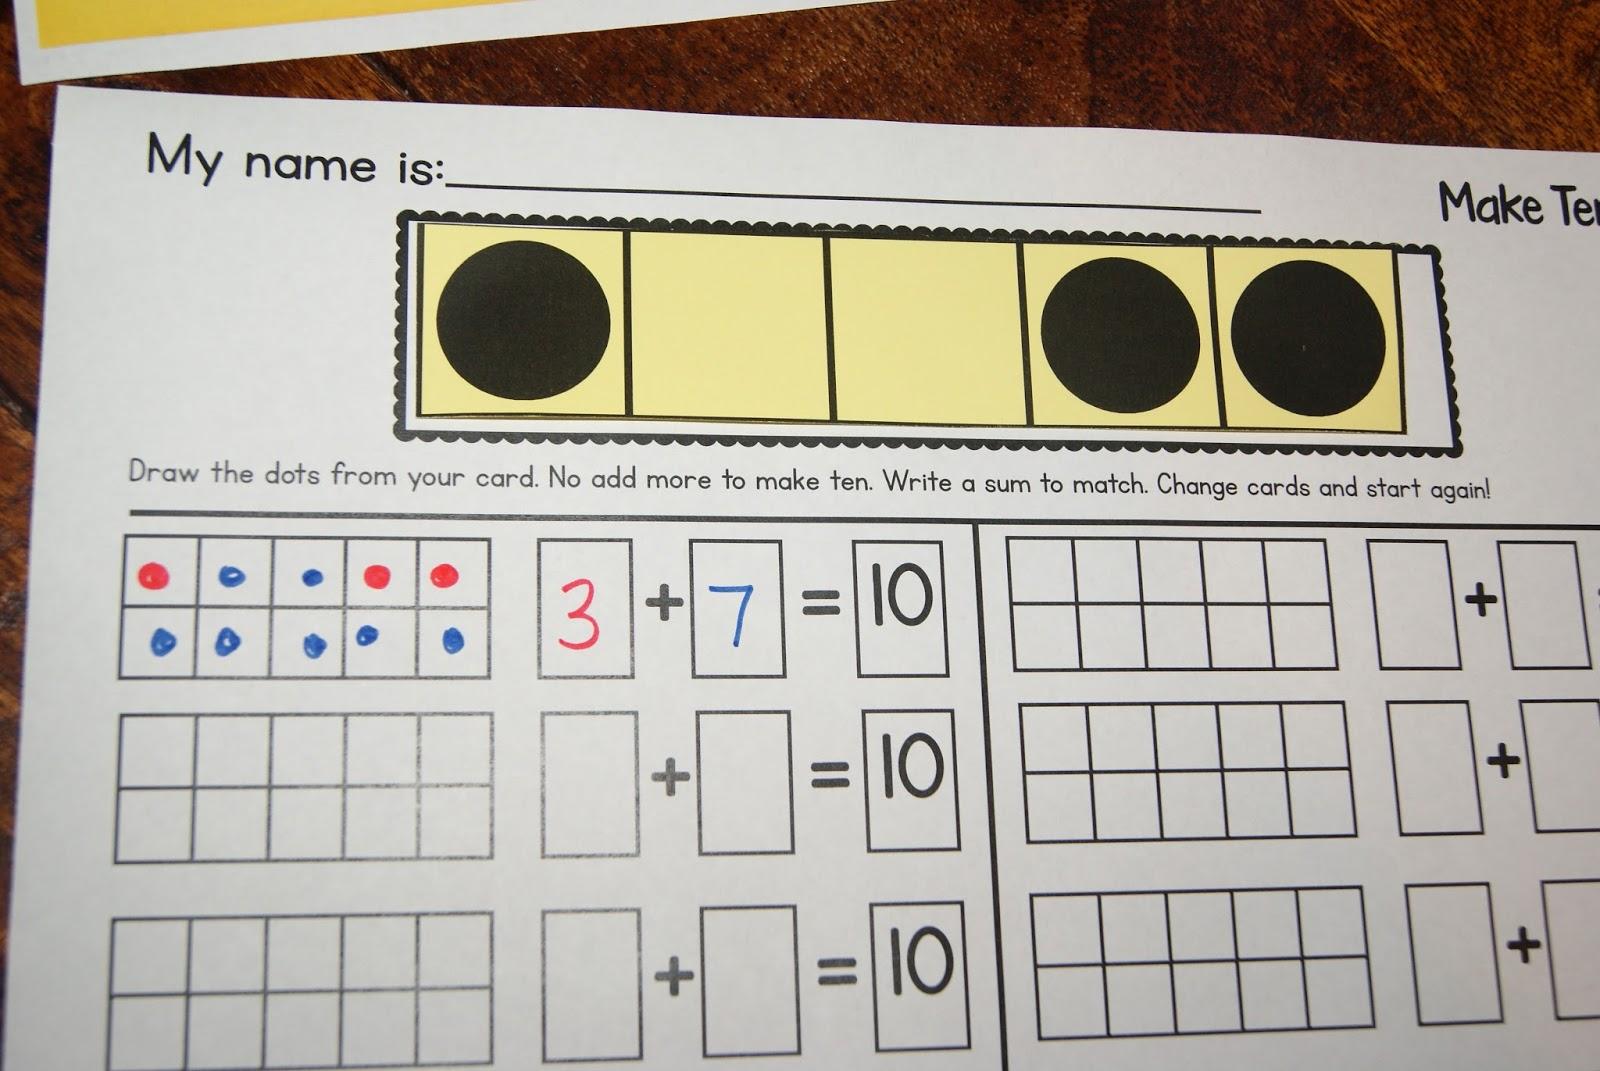 worksheet Mab Worksheets workbooks mab worksheets free printable for pre fun five frames from the pond worksheets